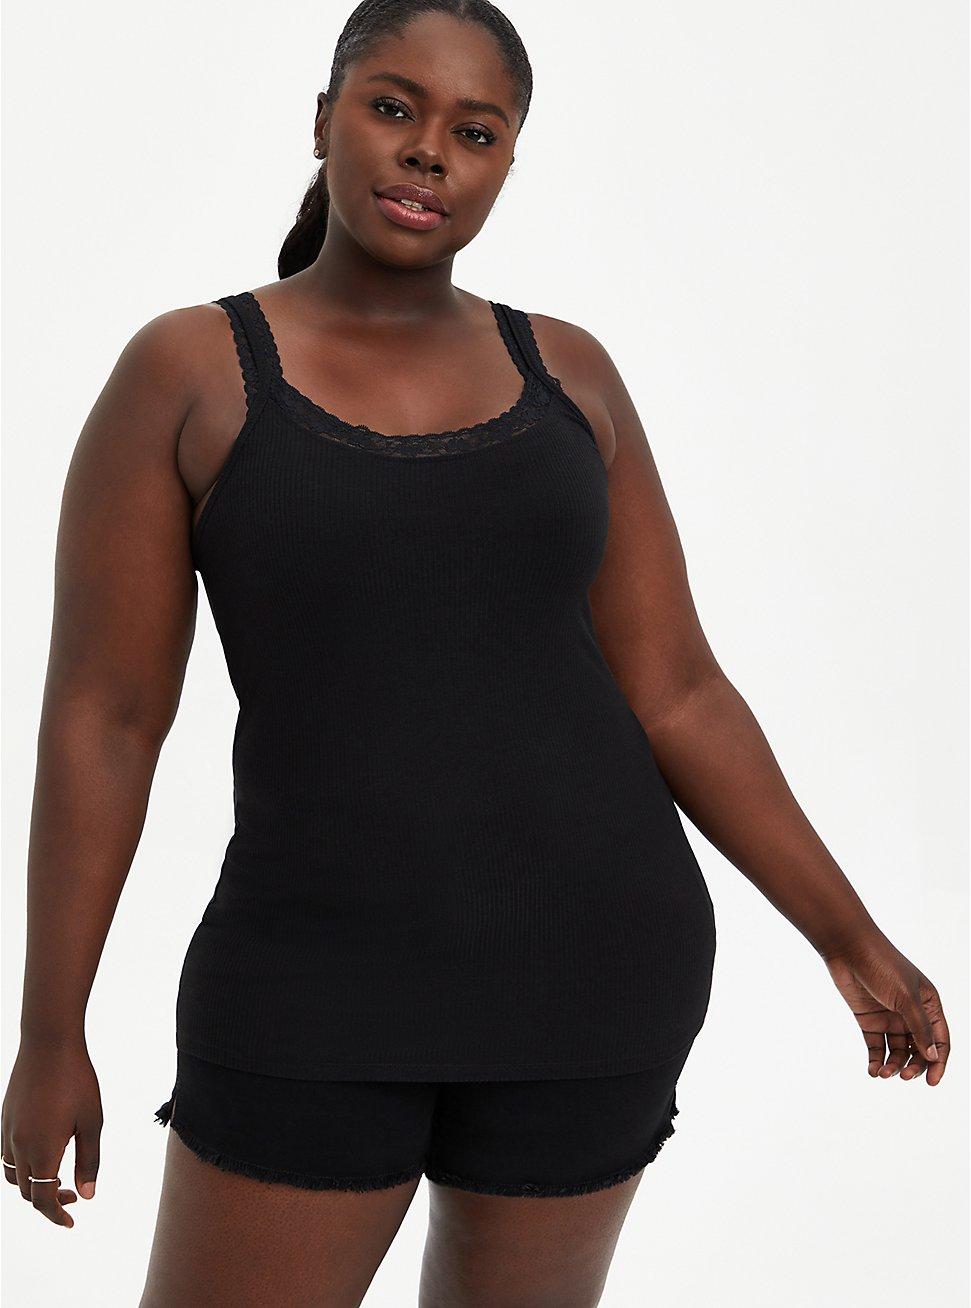 Plus Size Lace Strap Rib Tank - Black , DEEP BLACK, hi-res